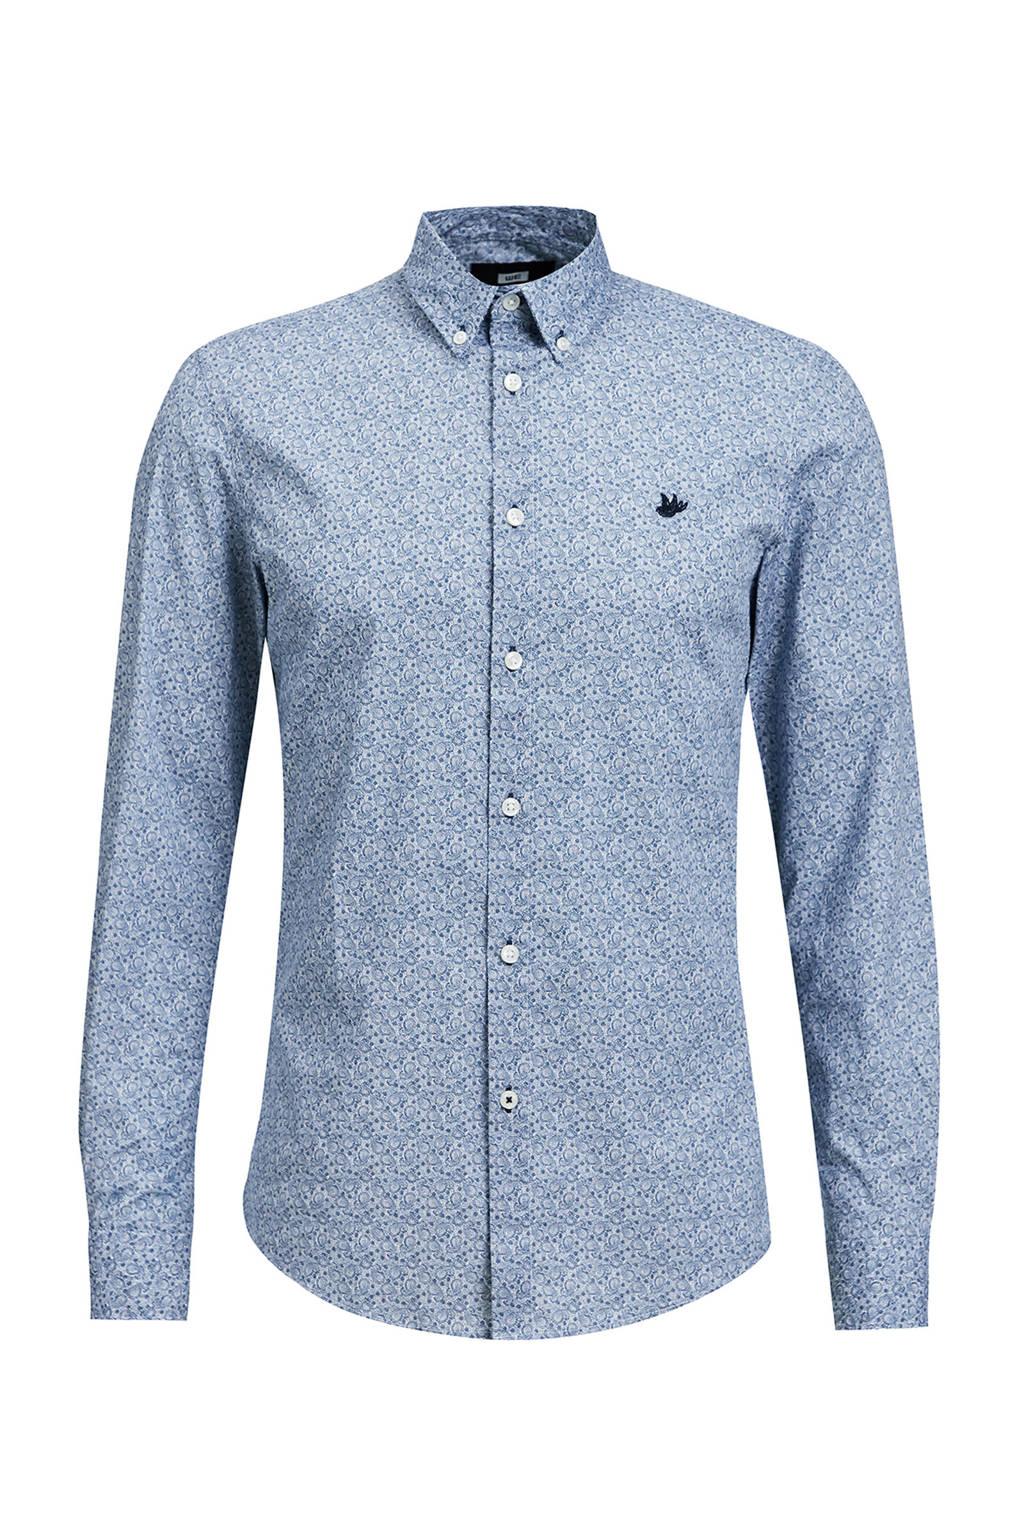 WE Fashion regular fit overhemd met all over print royal navy, Royal Navy